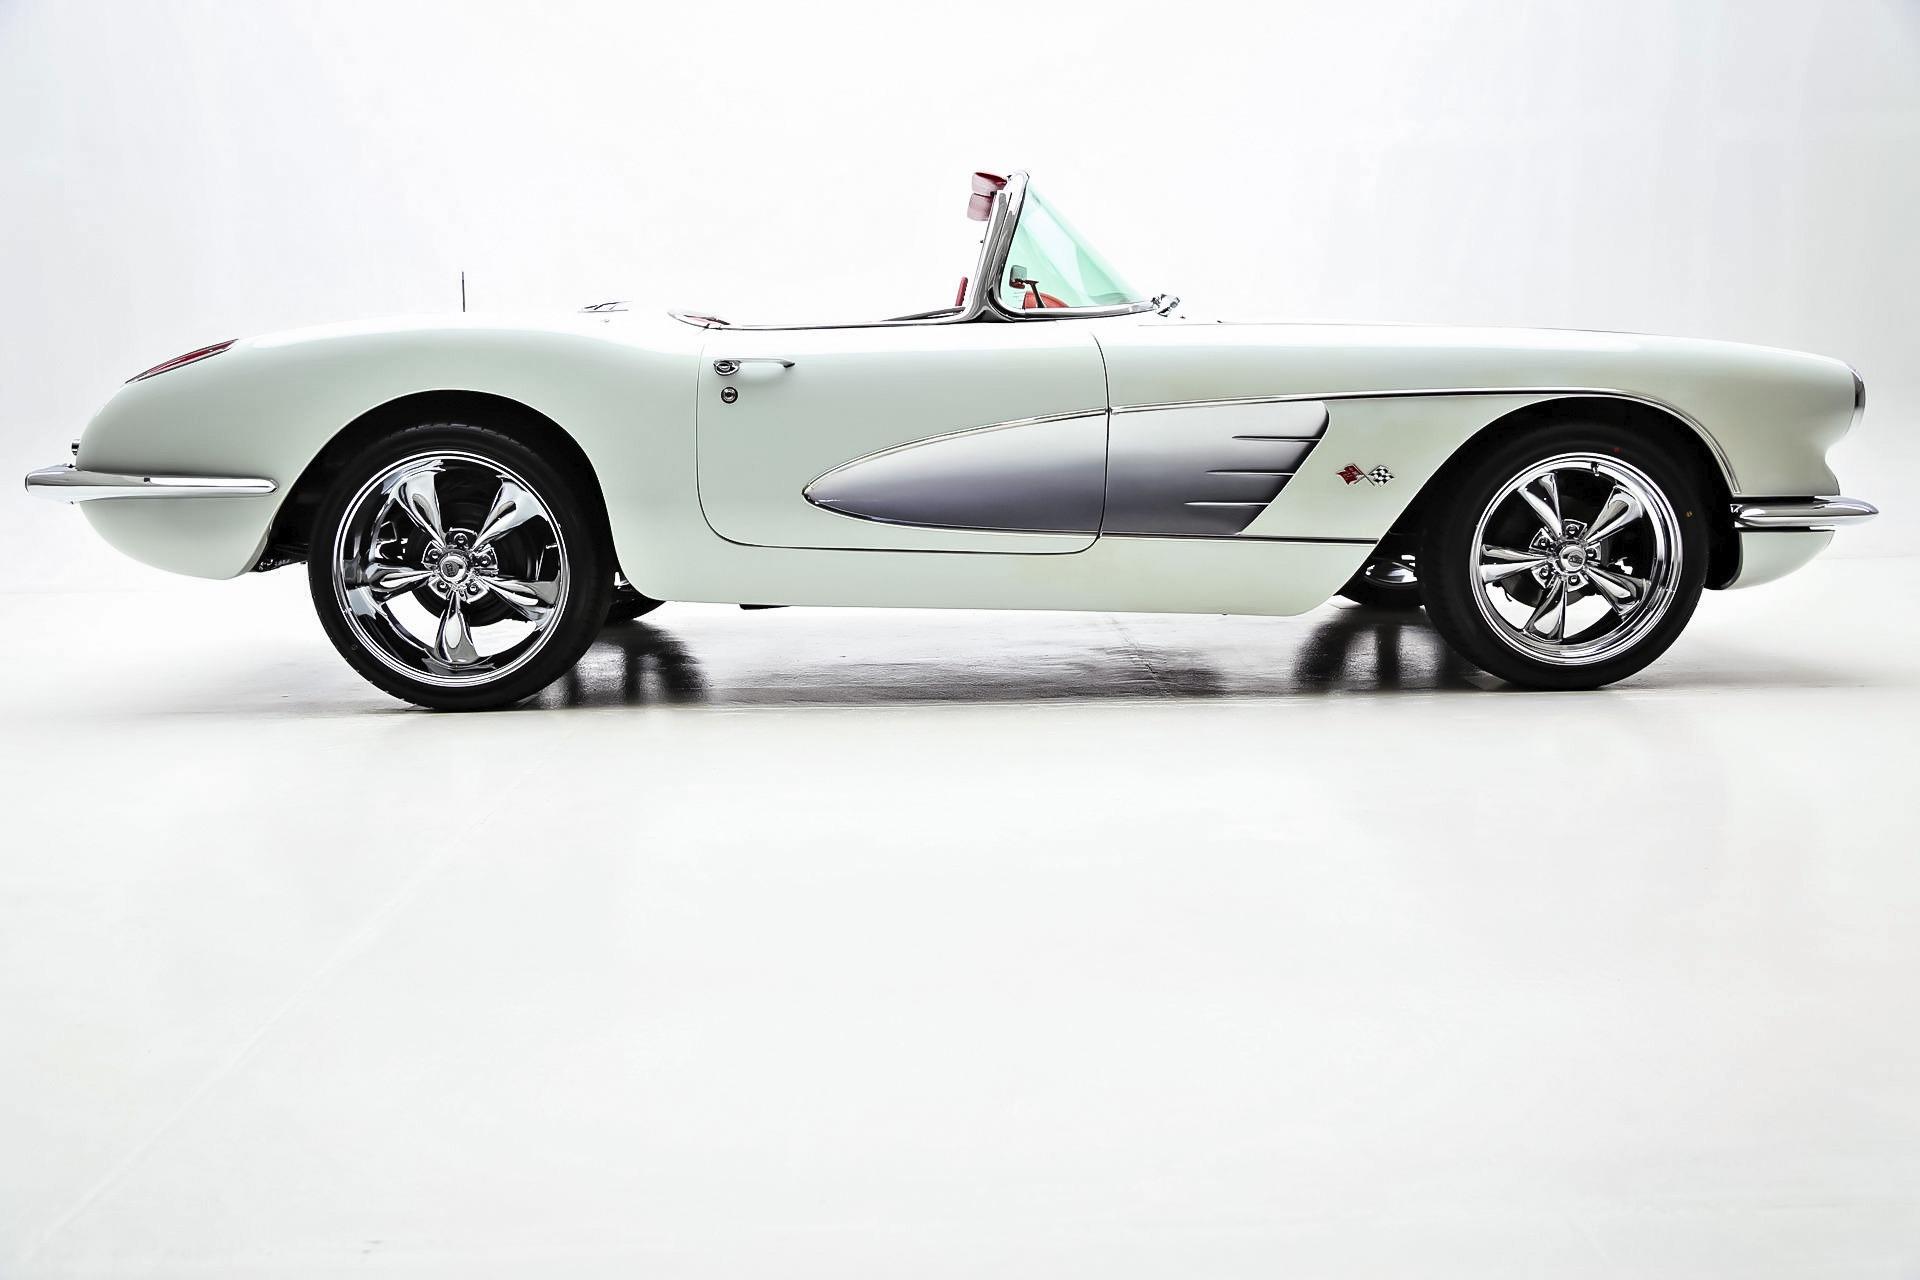 Black And White Corvette Classic Cars